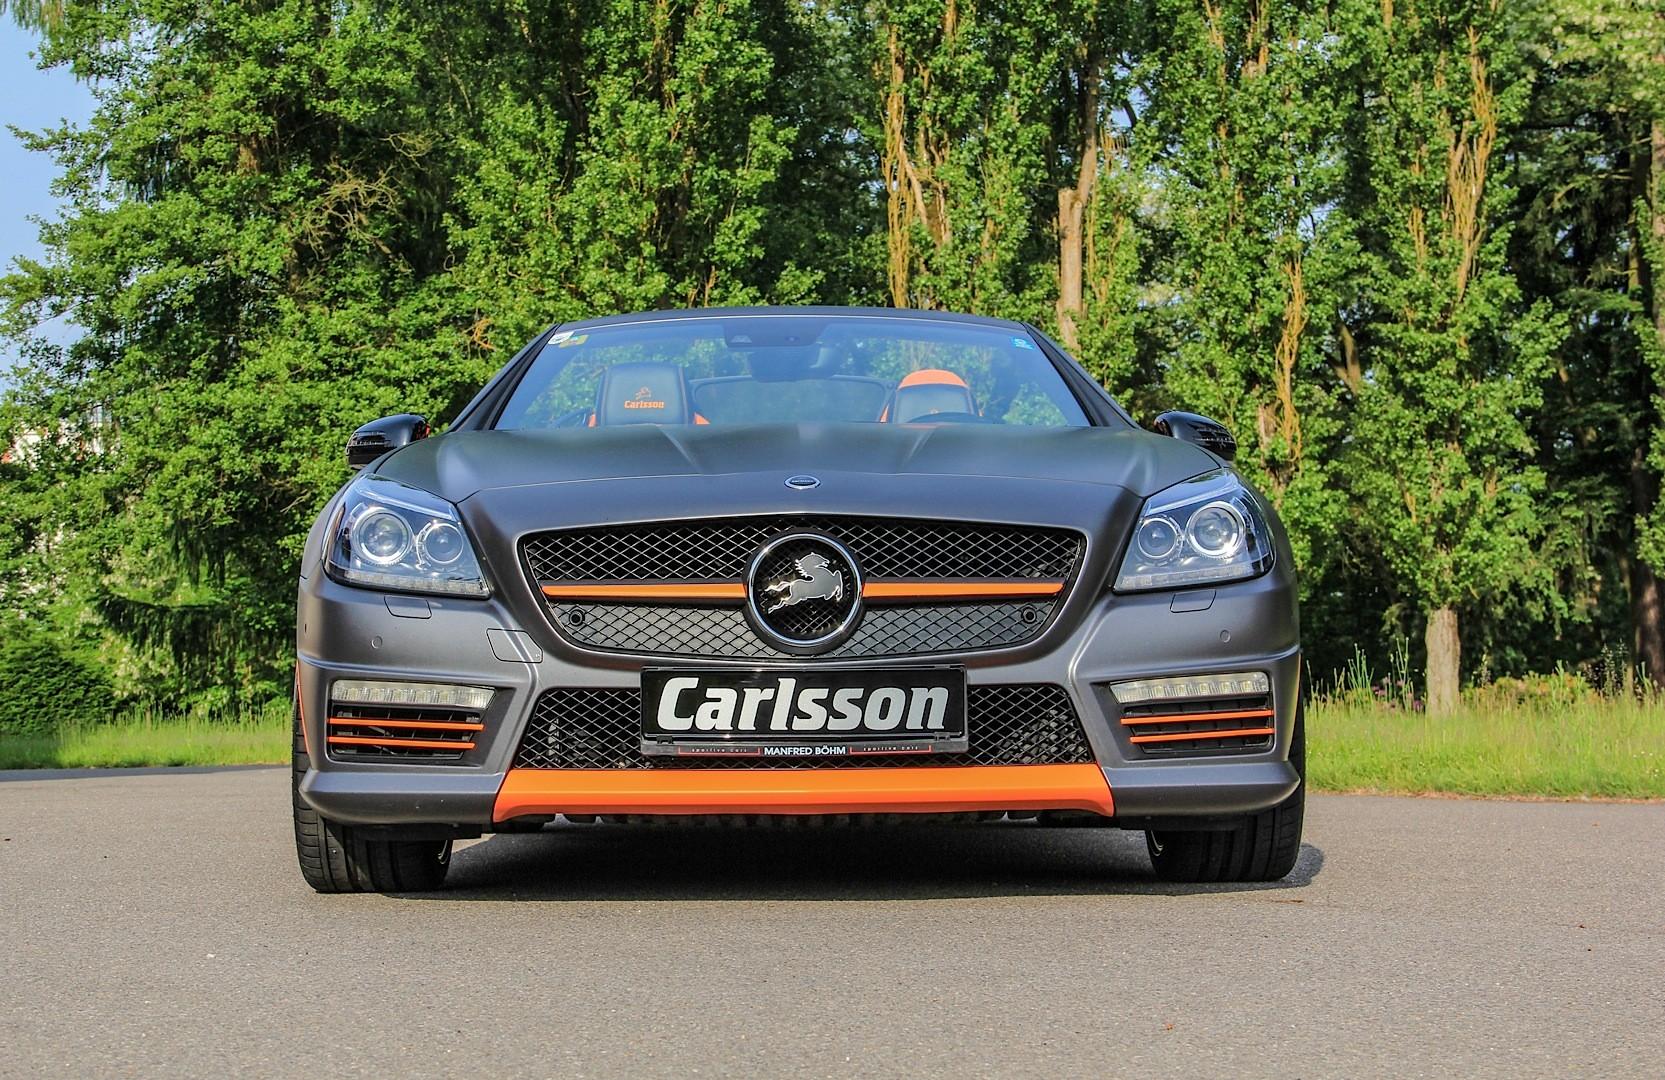 2017 Mercedes Benz Gla250 >> Mercedes SLK 55 AMG Gets Carlsson Interior with Orange and Carbon Trim - autoevolution